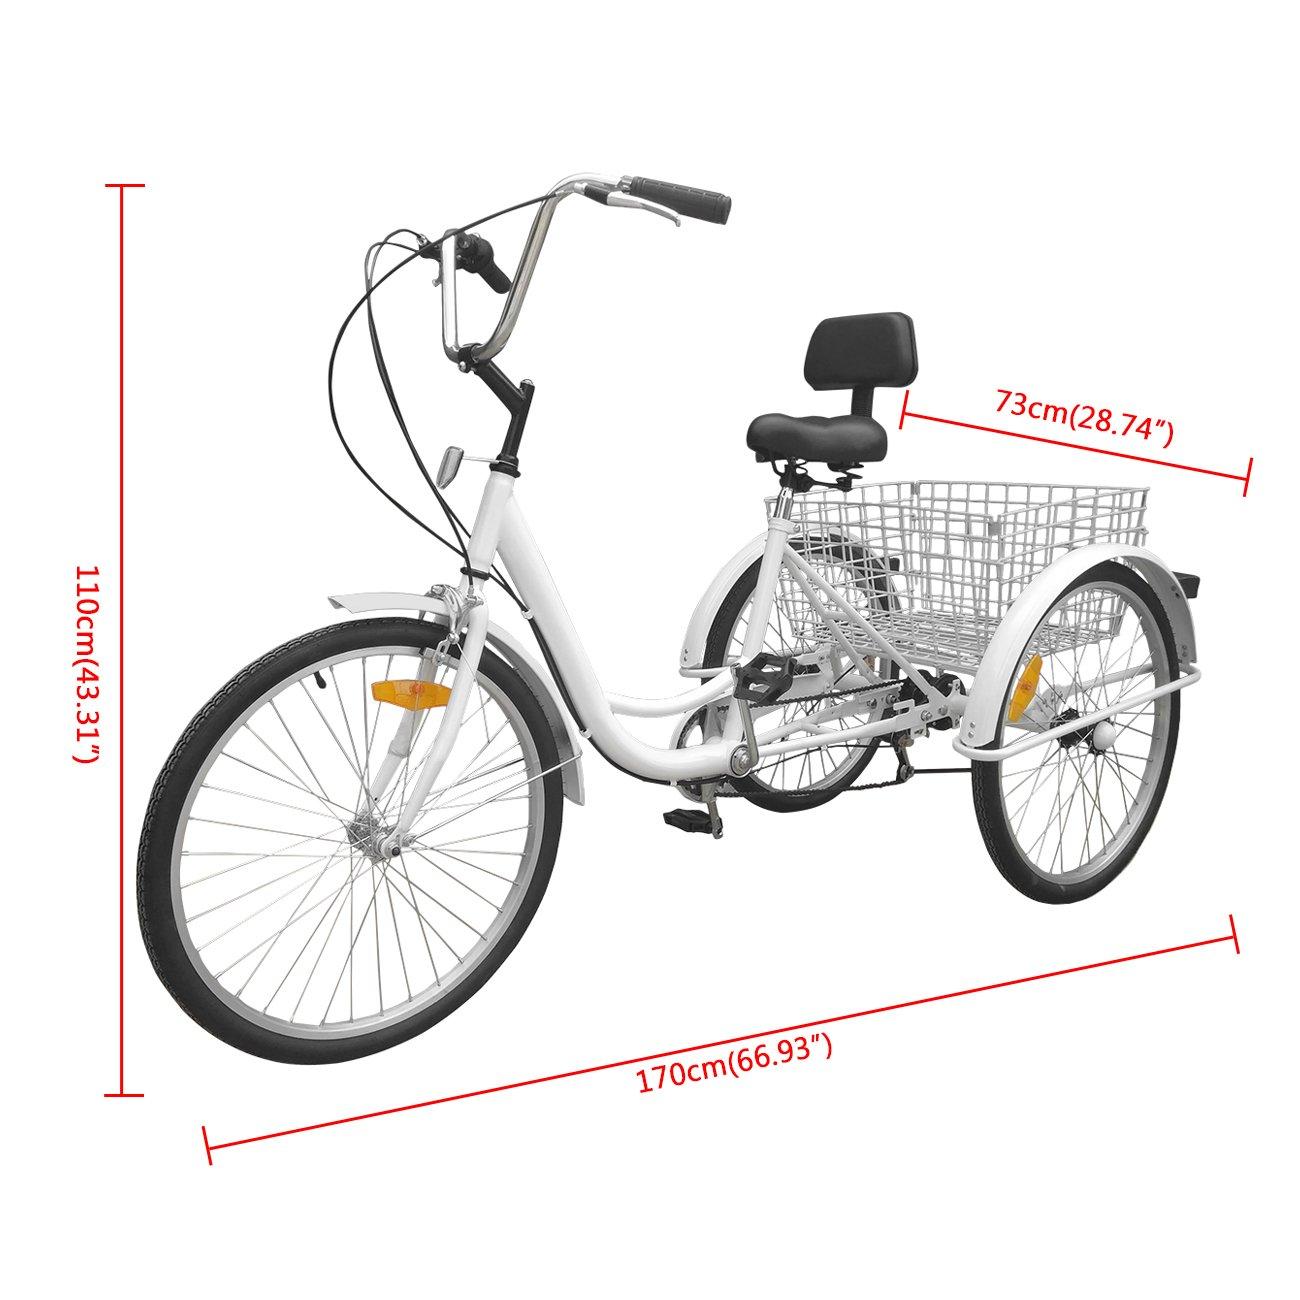 Bici a 3 ruote Urban Paneltech per adulti 6 velocitàe cestino06